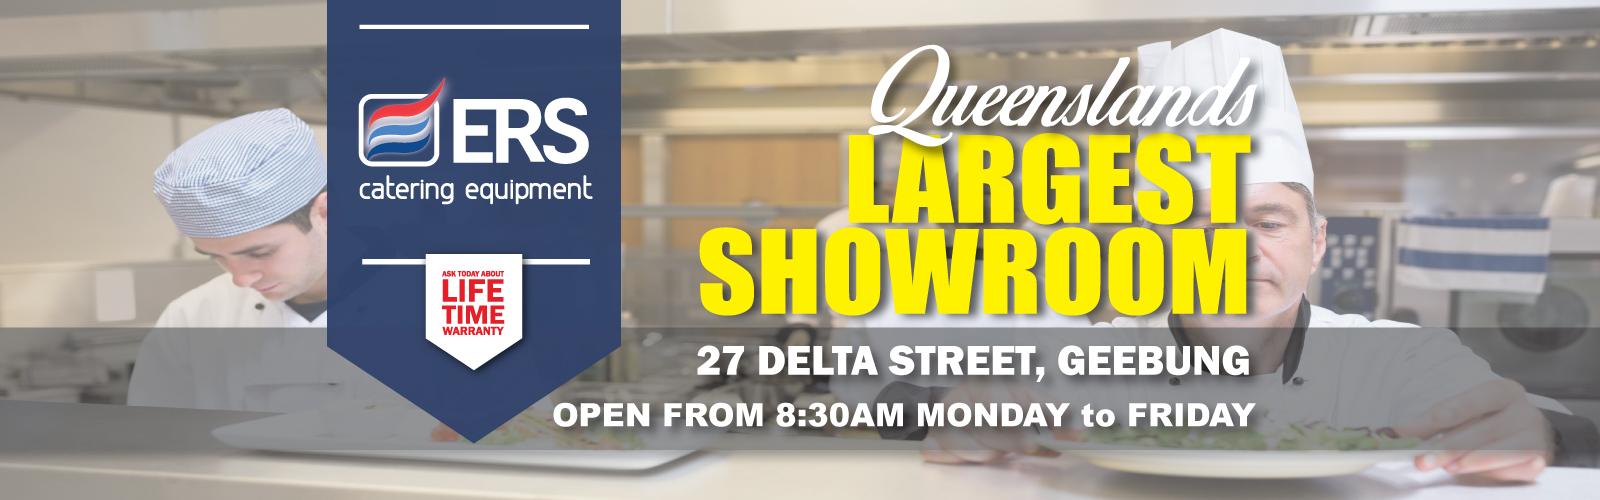 ERS Showroom 27 Delta St, Geebung QLD